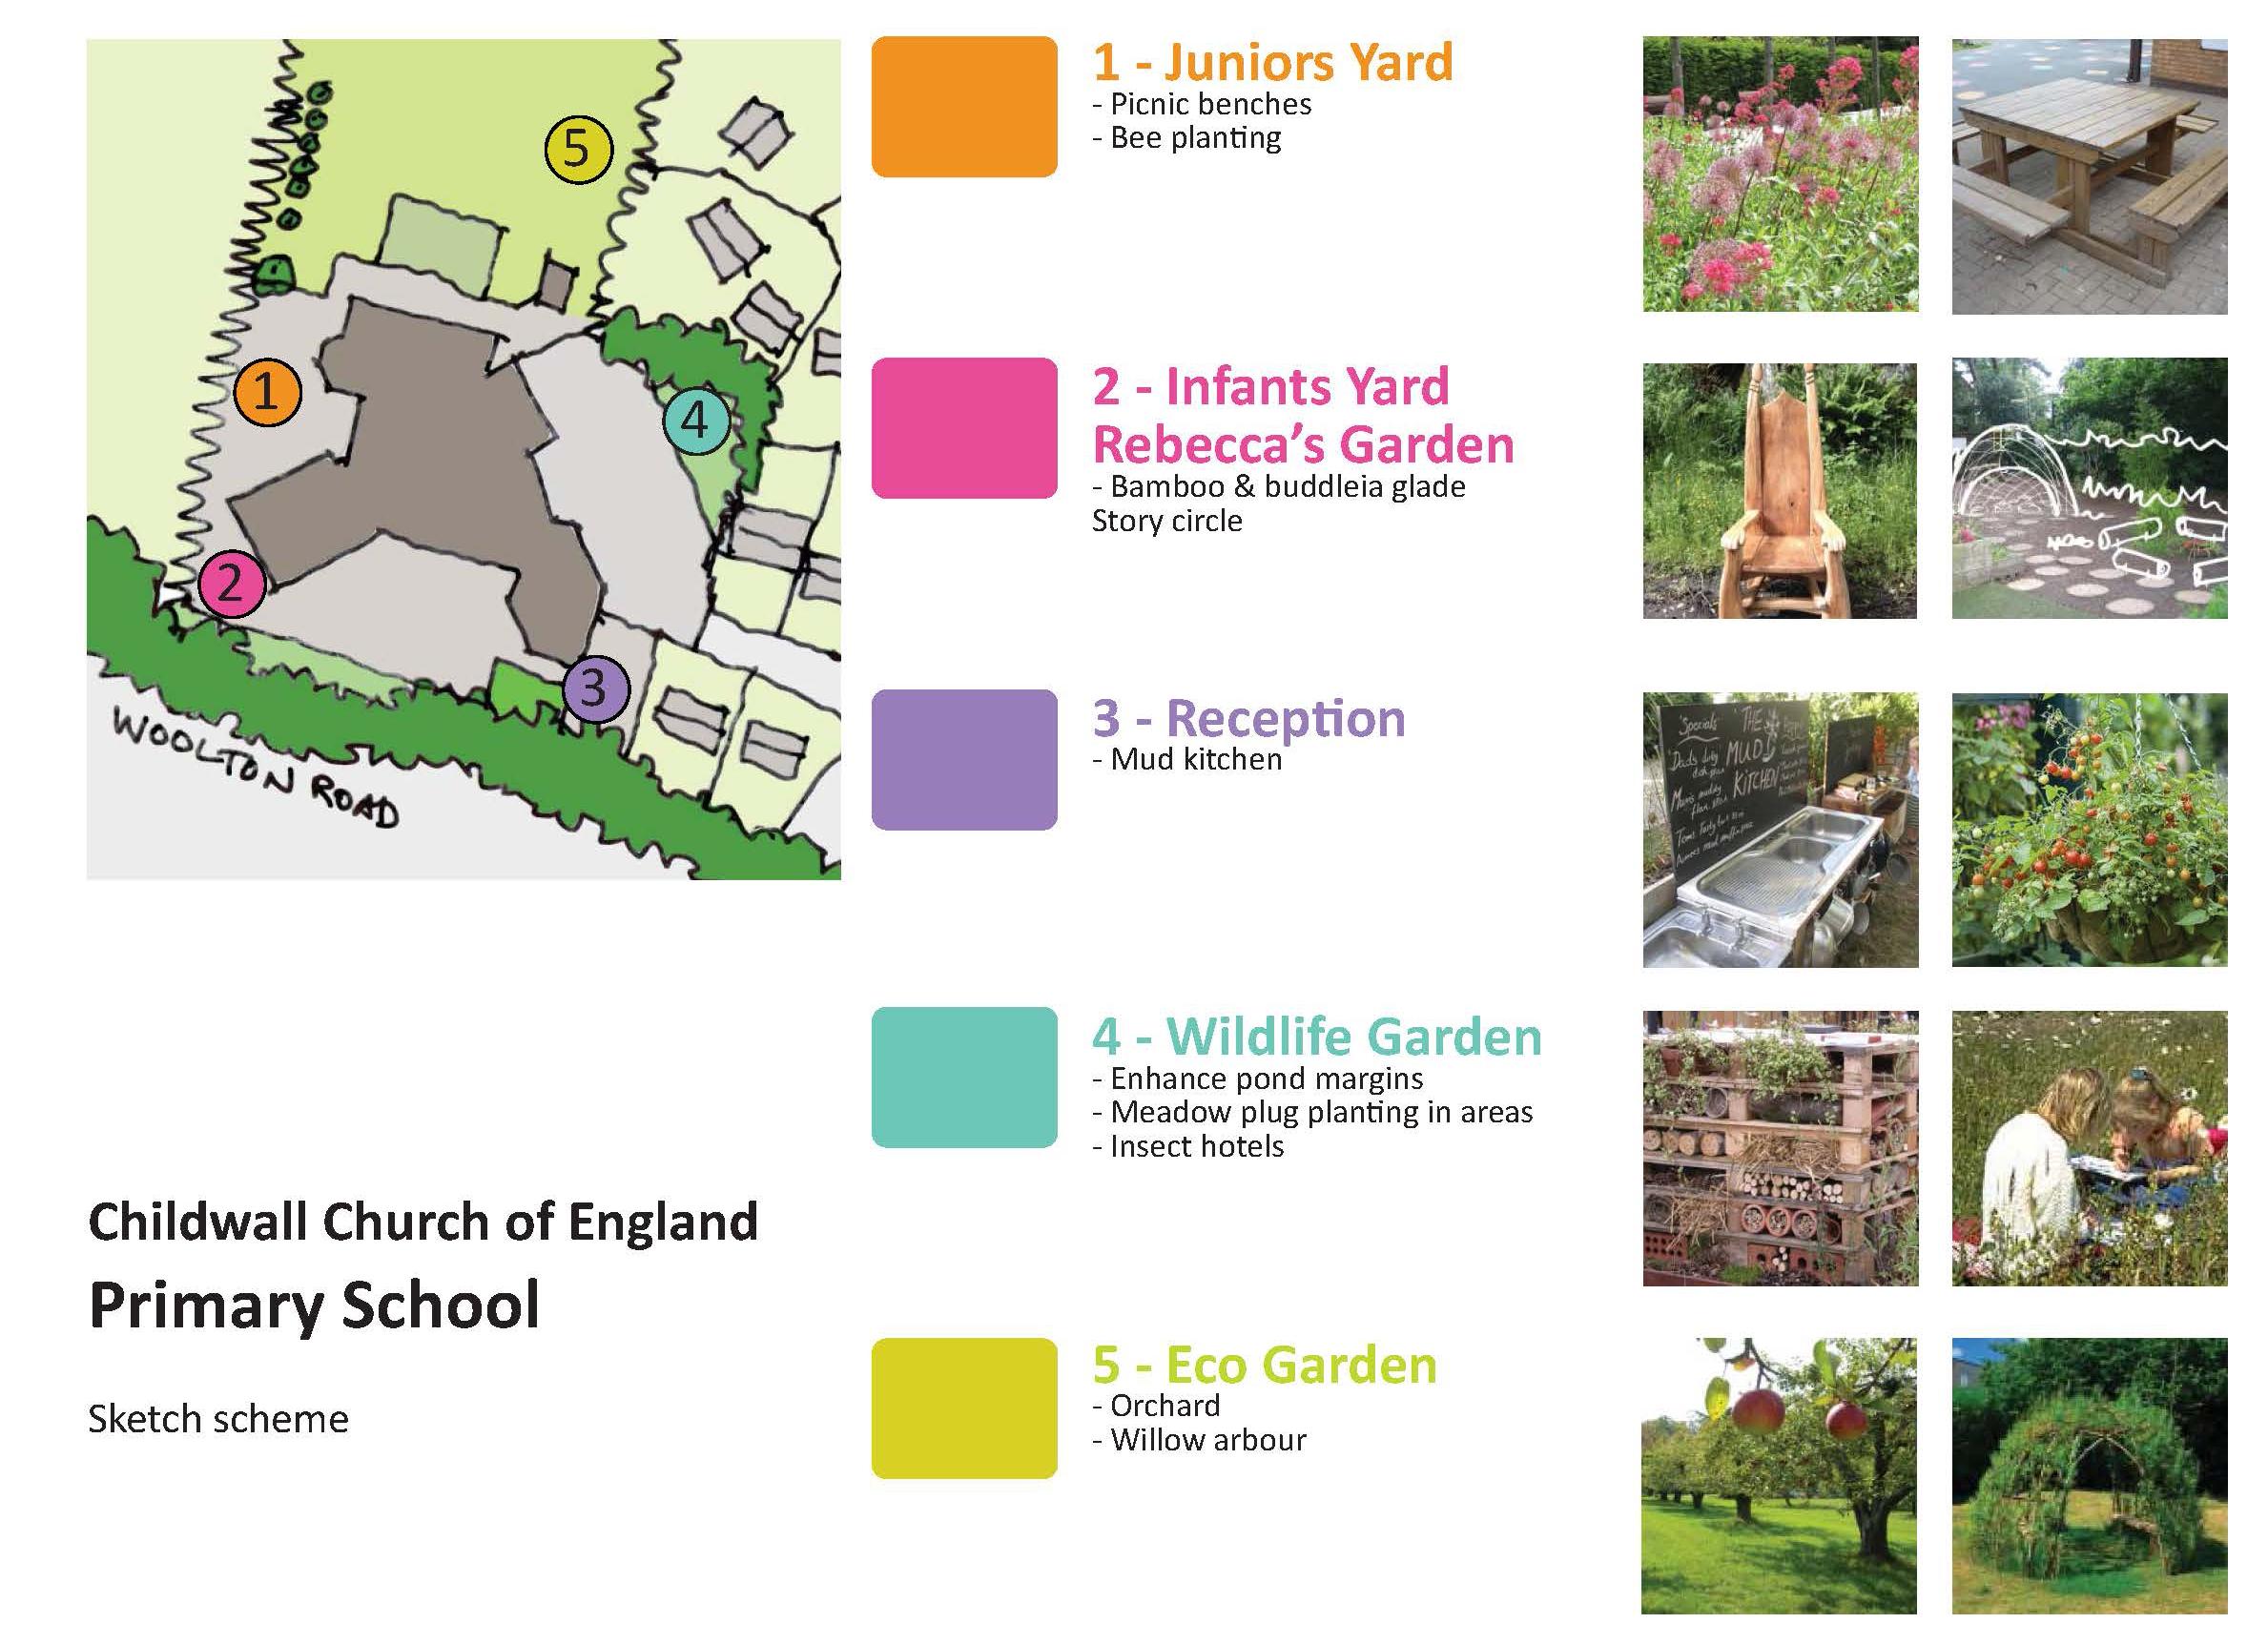 Primary school design concepts